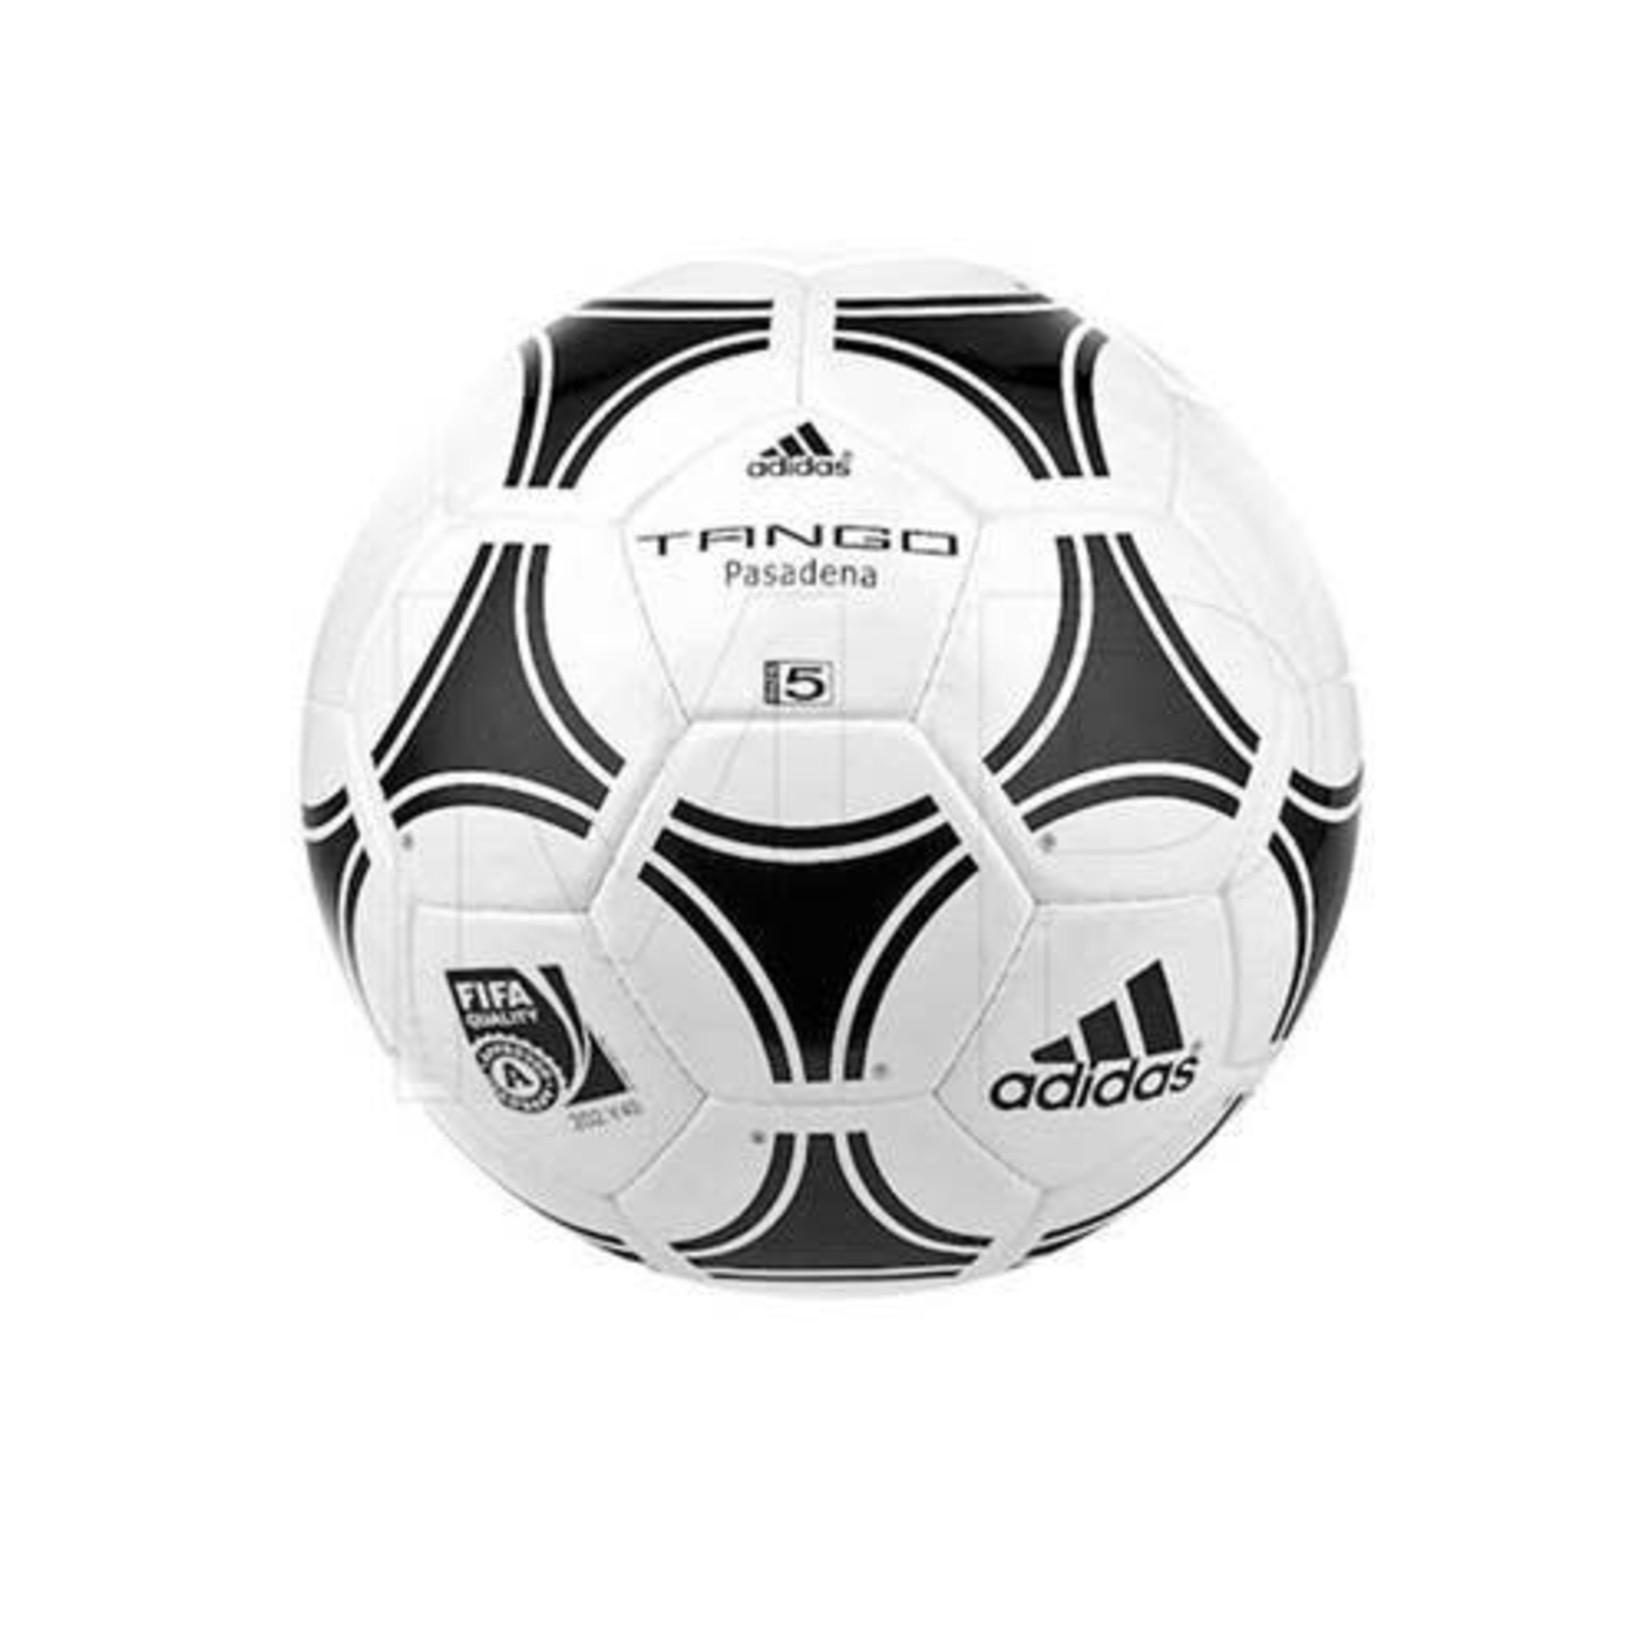 Adidas Adidas Soccer Ball, Tango Pasadena